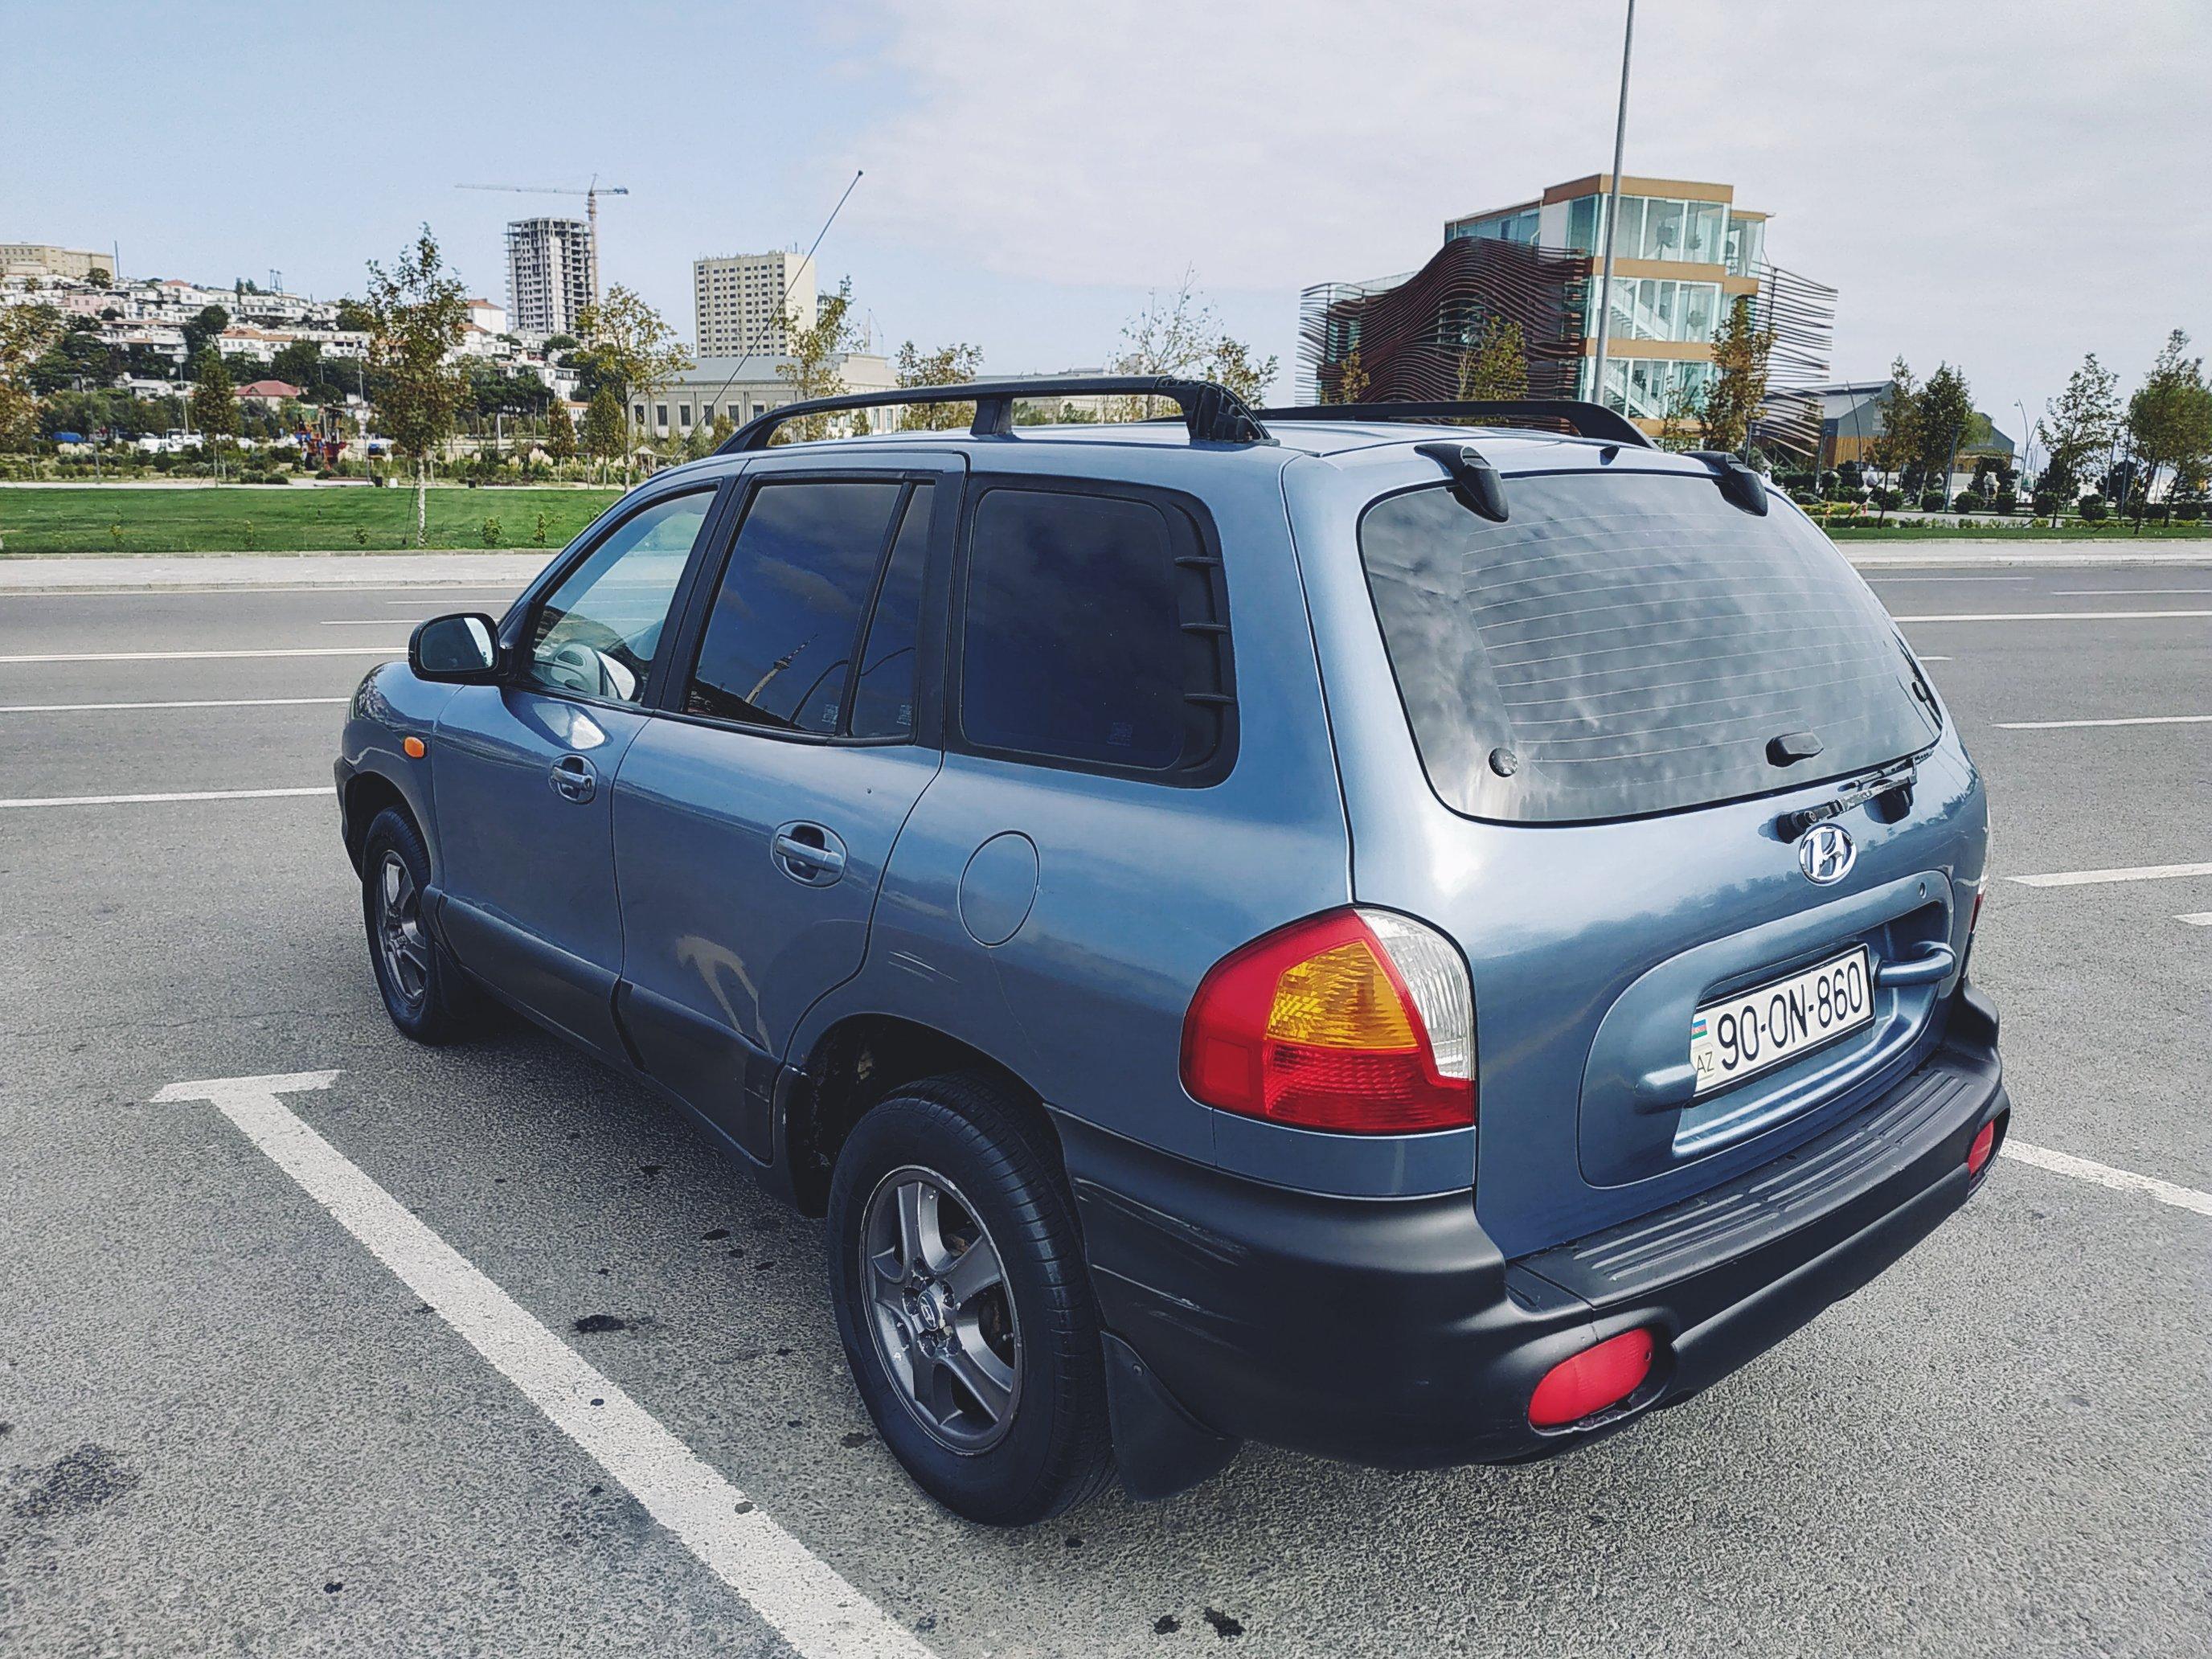 Hyundai Santa FE 2.0(lt) 2001 İkinci əl  $9800